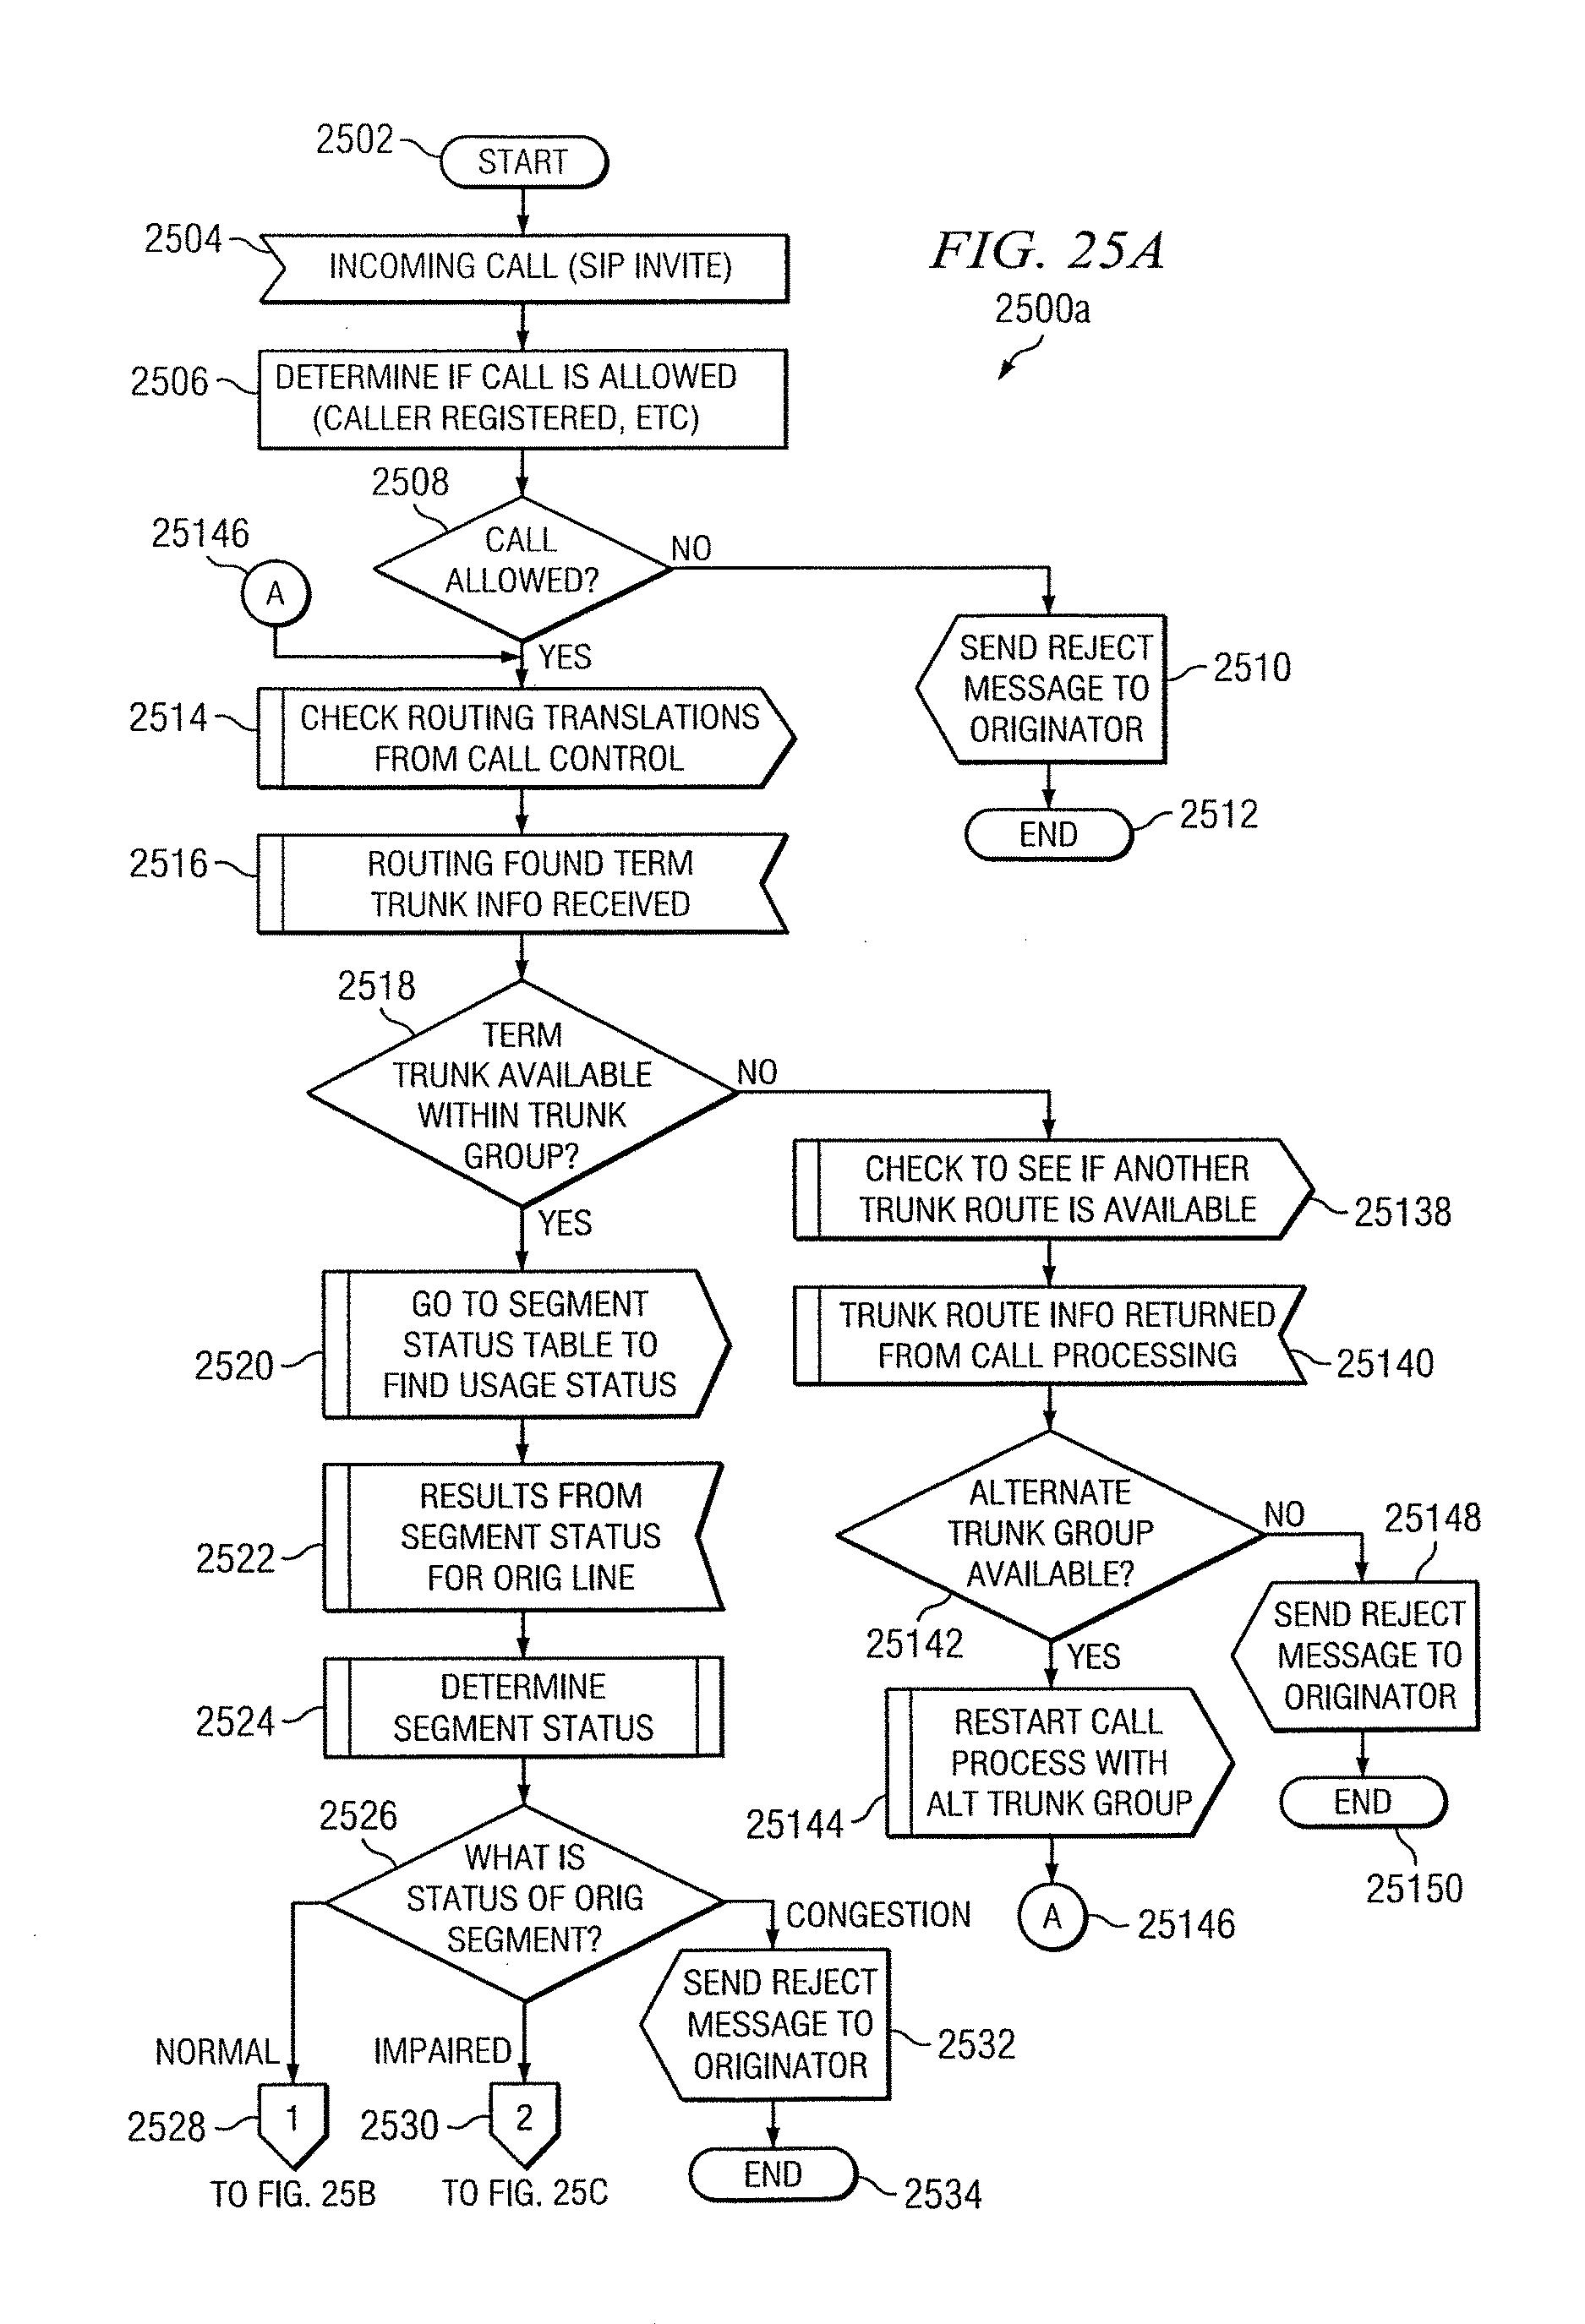 Patent US 9,992,348 B2